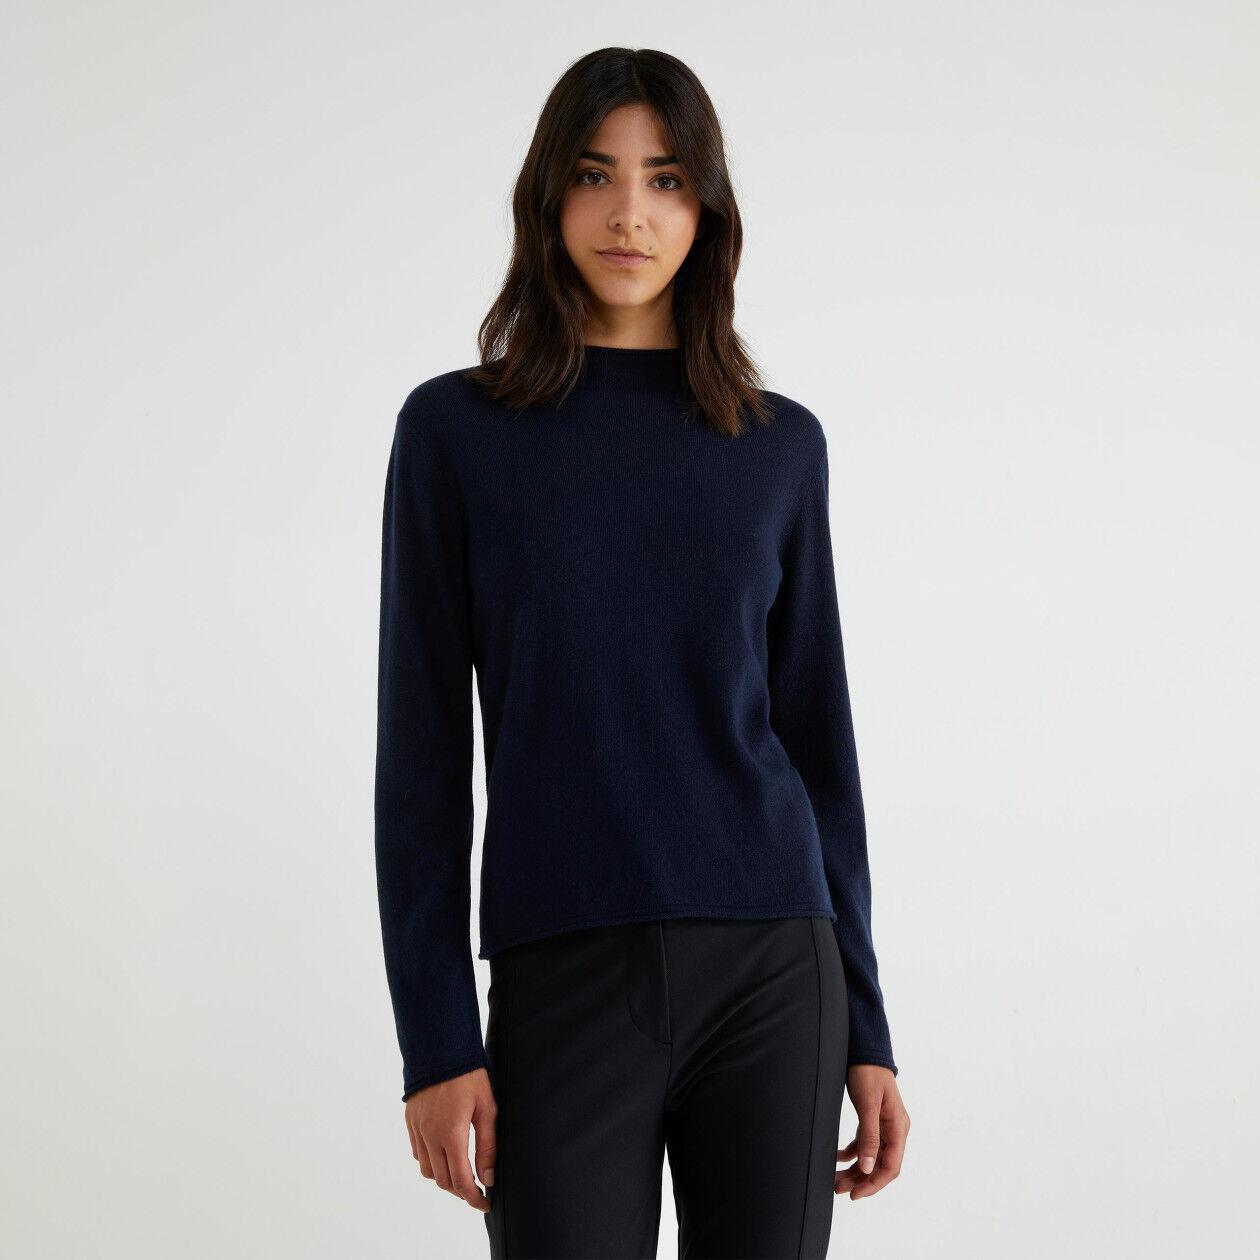 Cashmere blend turtleneck sweater